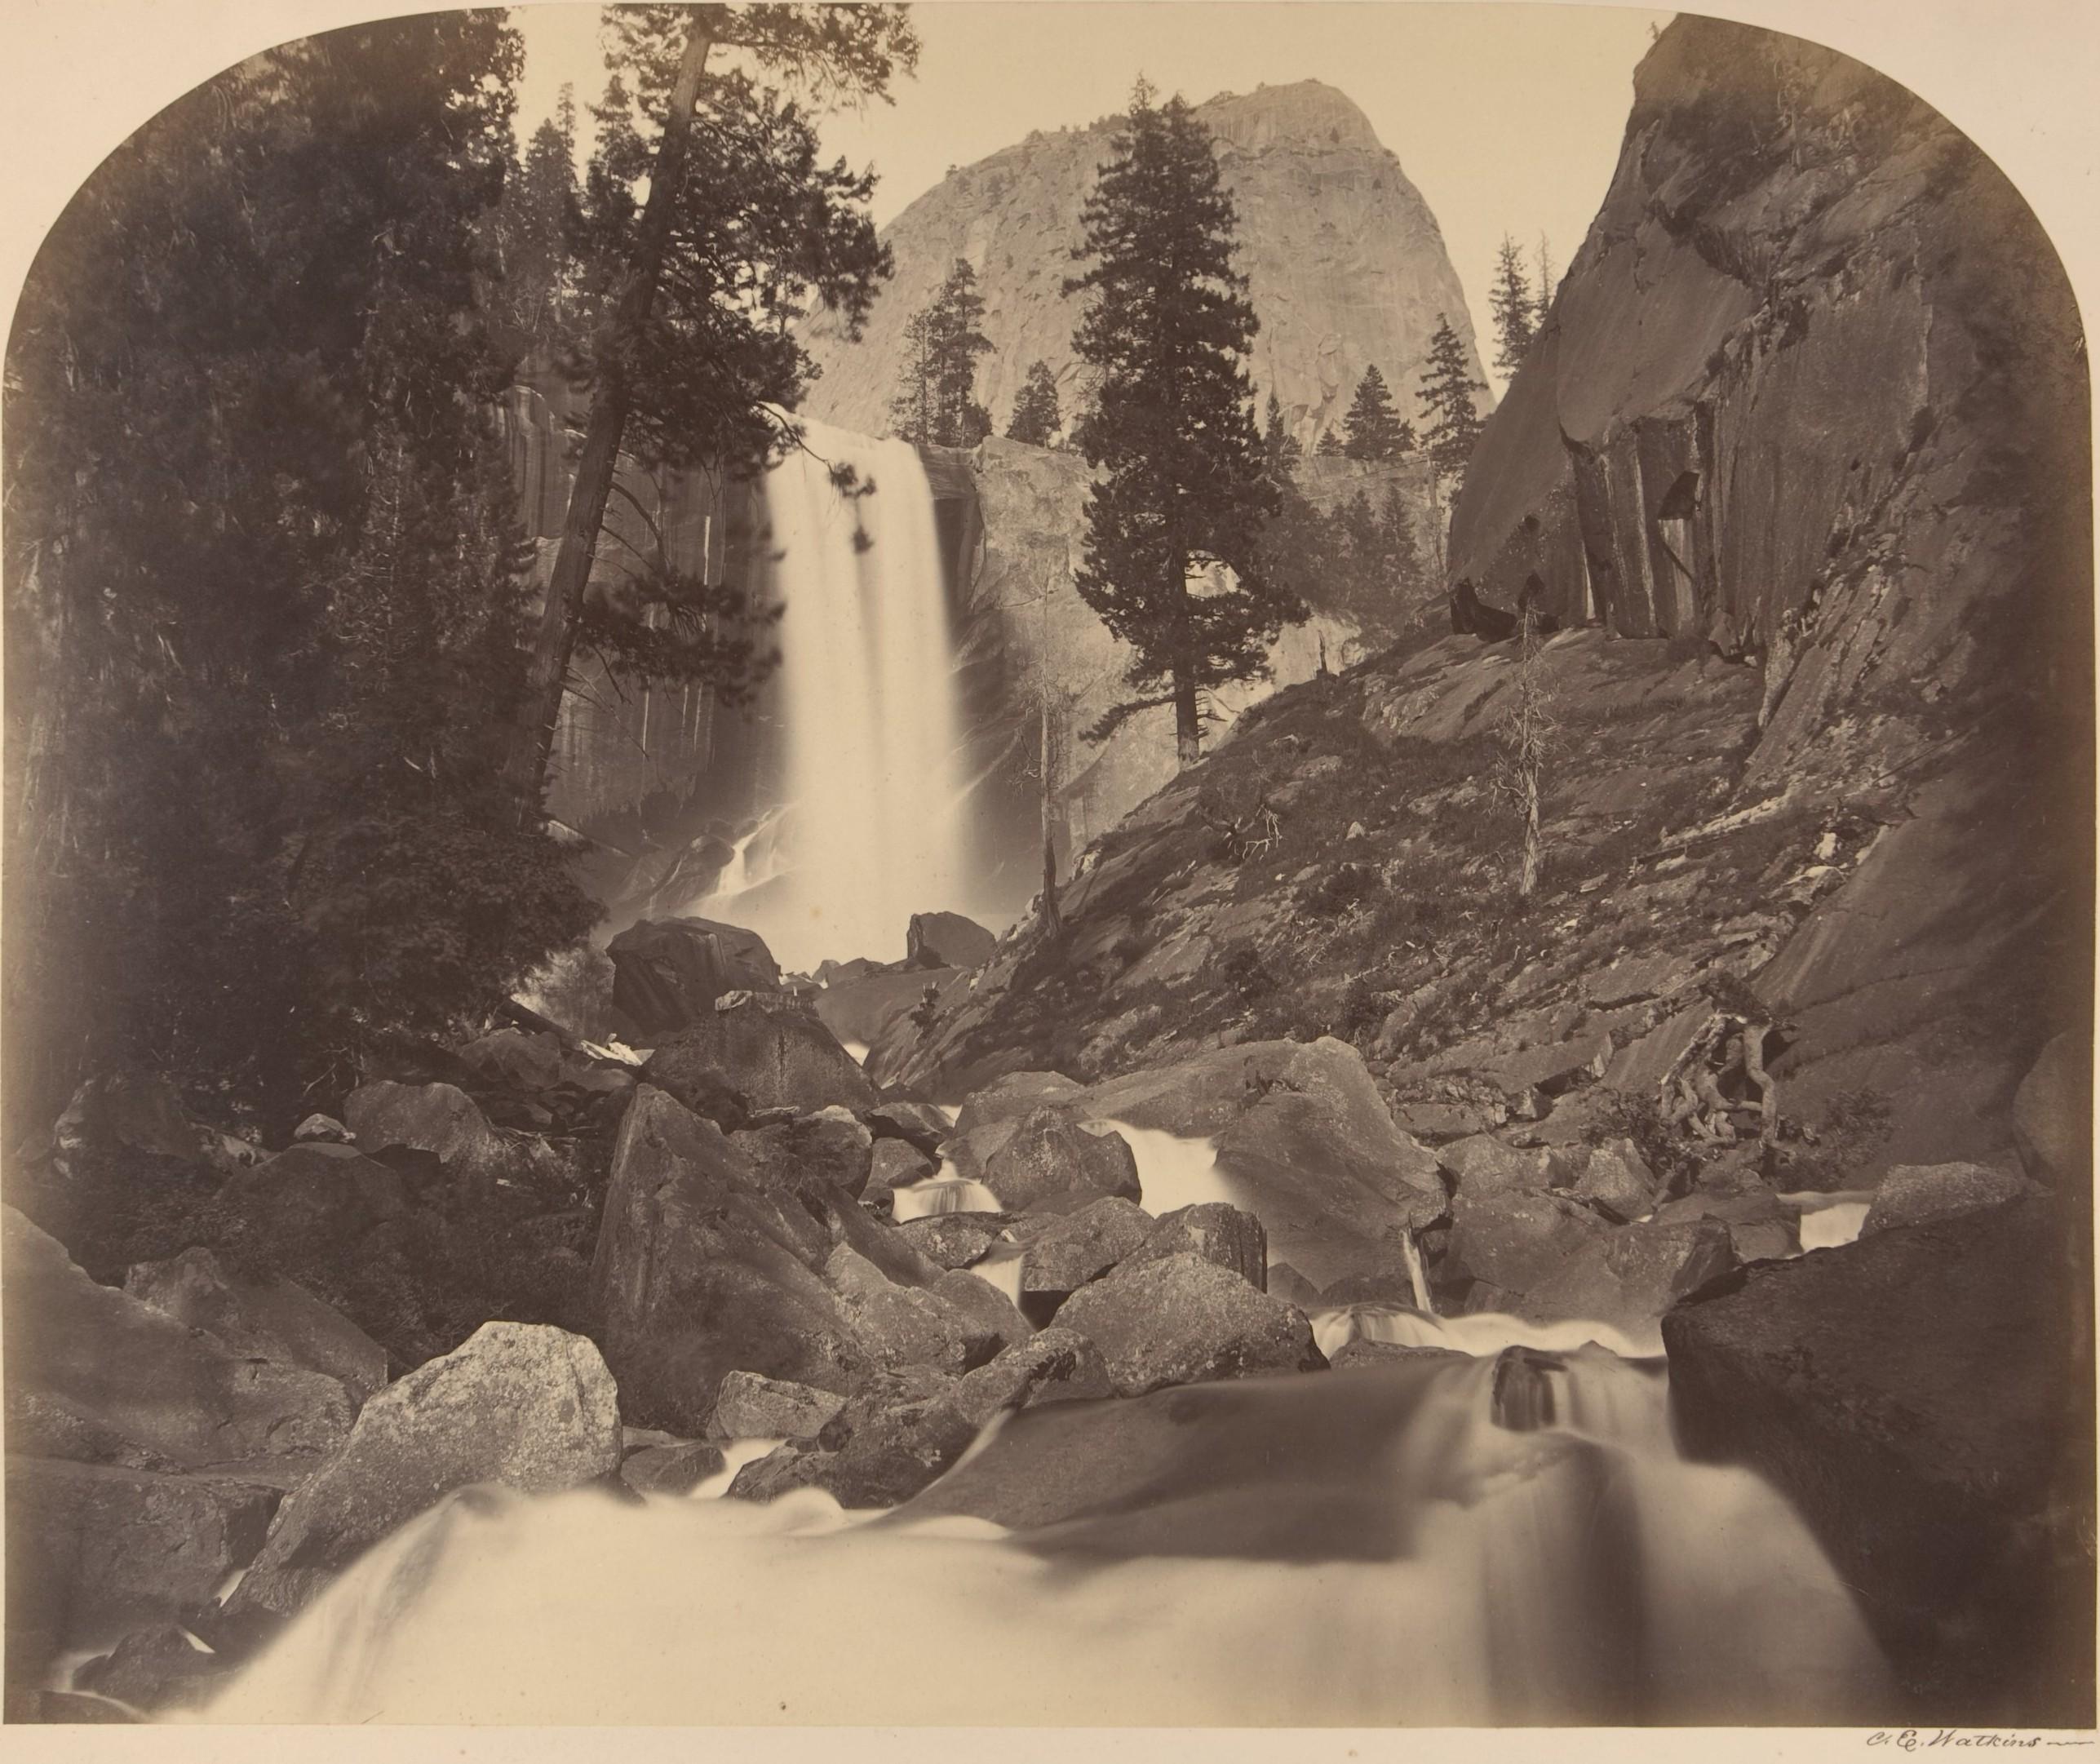 Fotó: Carleton Watkins: Mt. Broderick in Distant Centre, Piroyac, Falling Chrystals, Vernal Fall, 1861 © Carleton Watkins / The Metropolitan Museum of Art